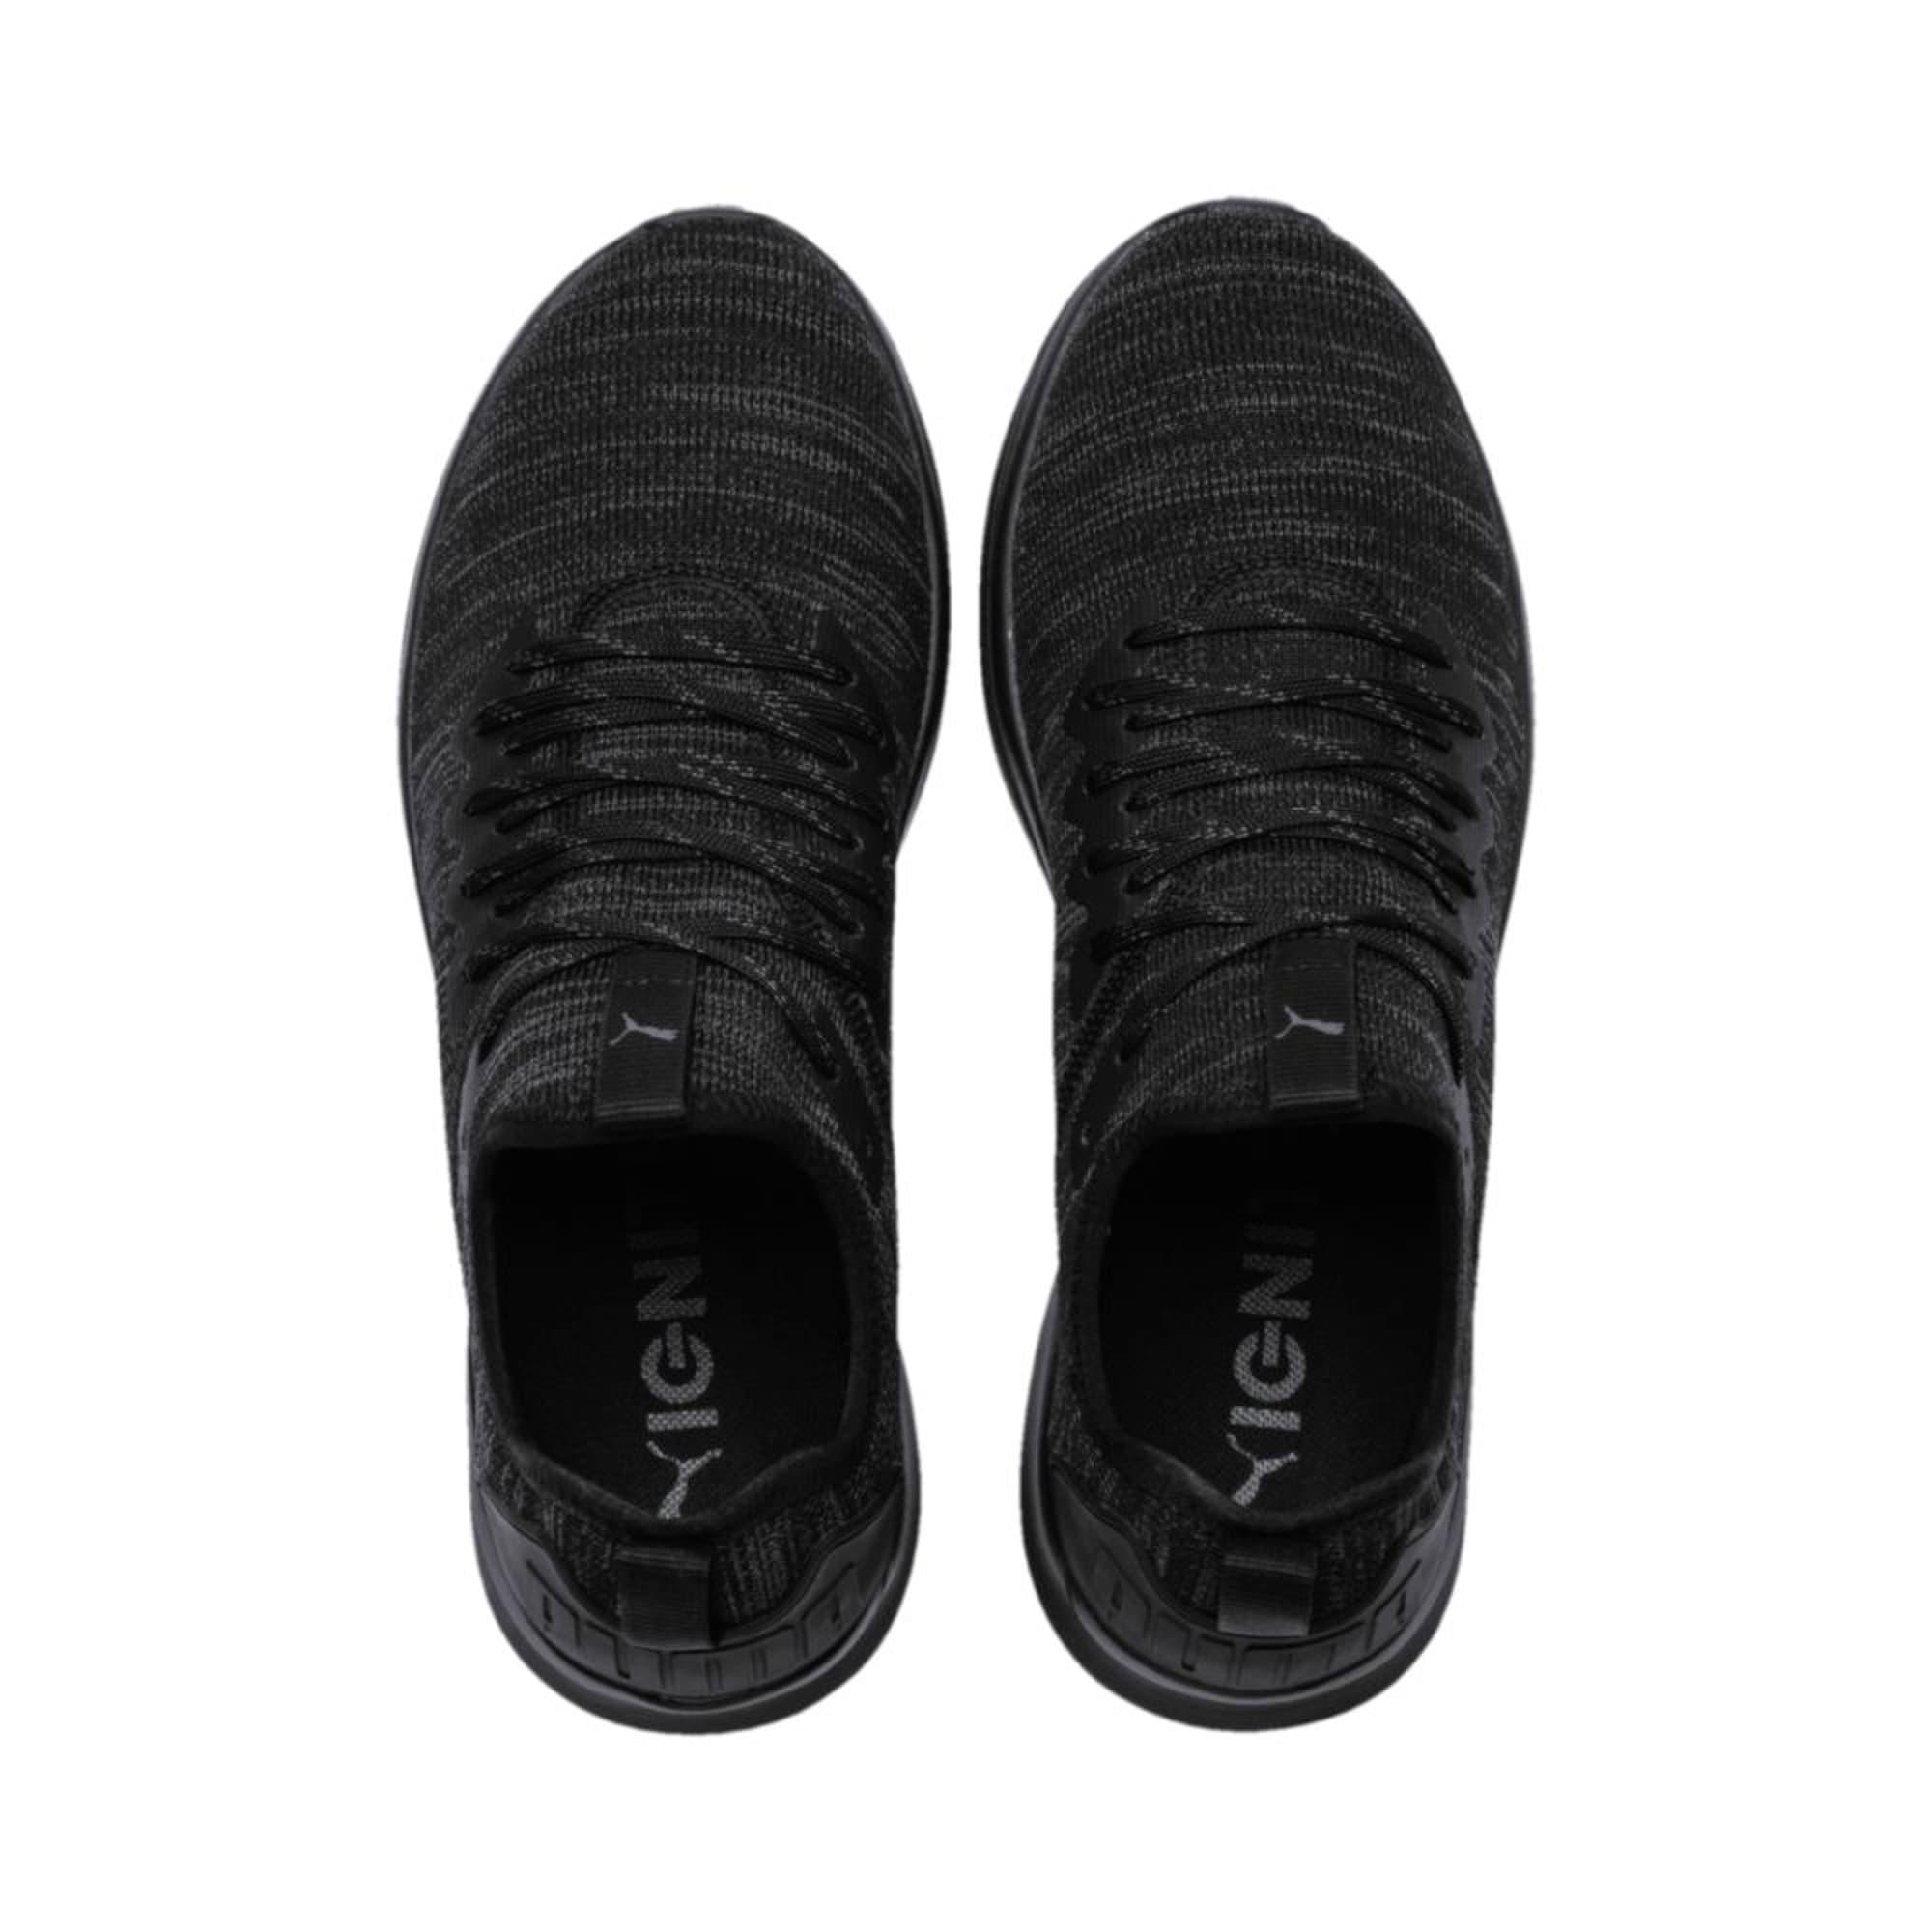 Thumbnail 3 of IGNITE Flash evoKNIT Men's Training Shoes, Puma Black, medium-IND